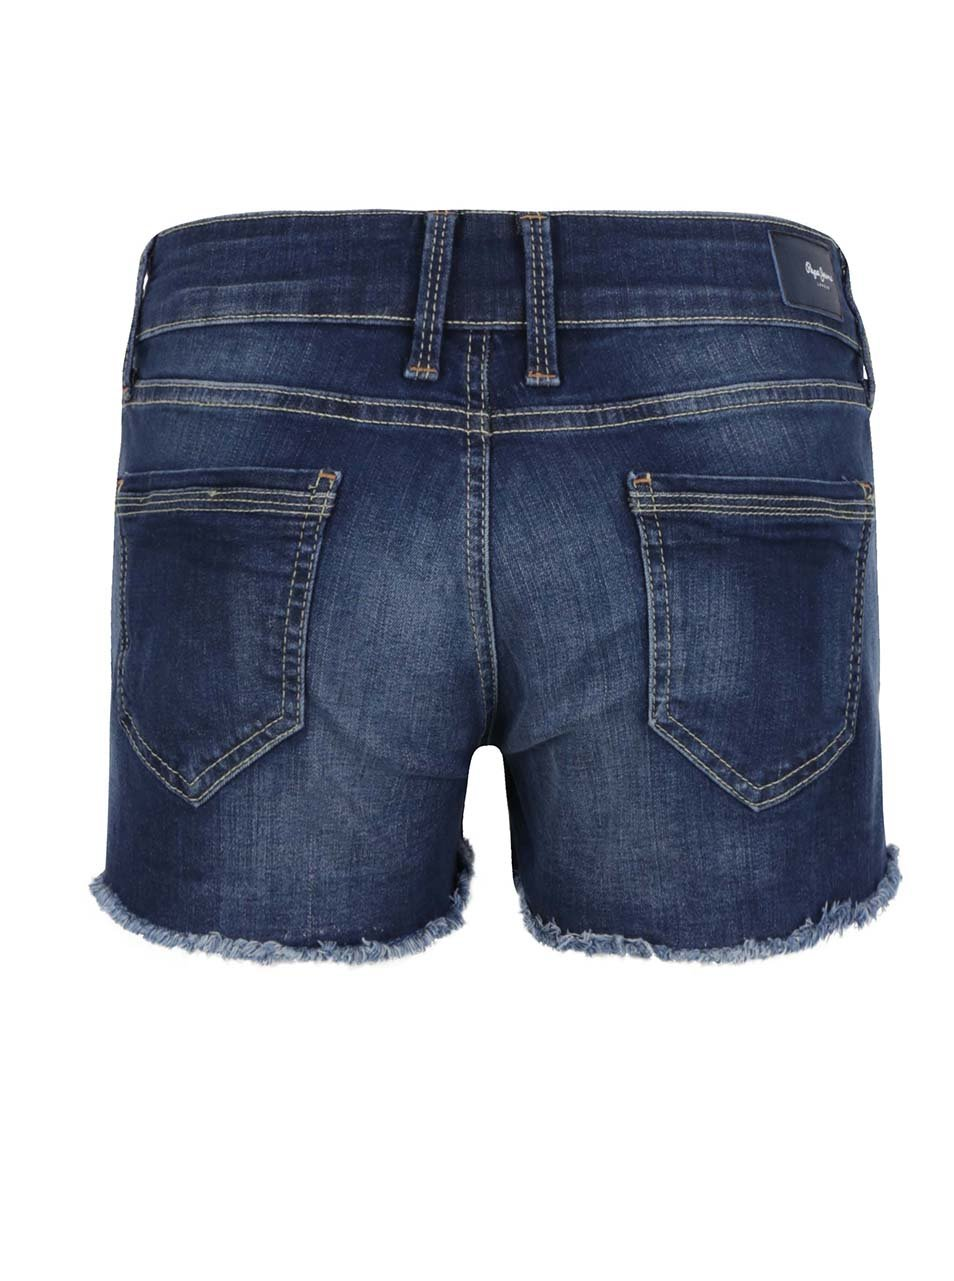 c3a20f7a046 Tmavomodré dámske rifľové krátke kraťasy Pepe Jeans Twigs ...